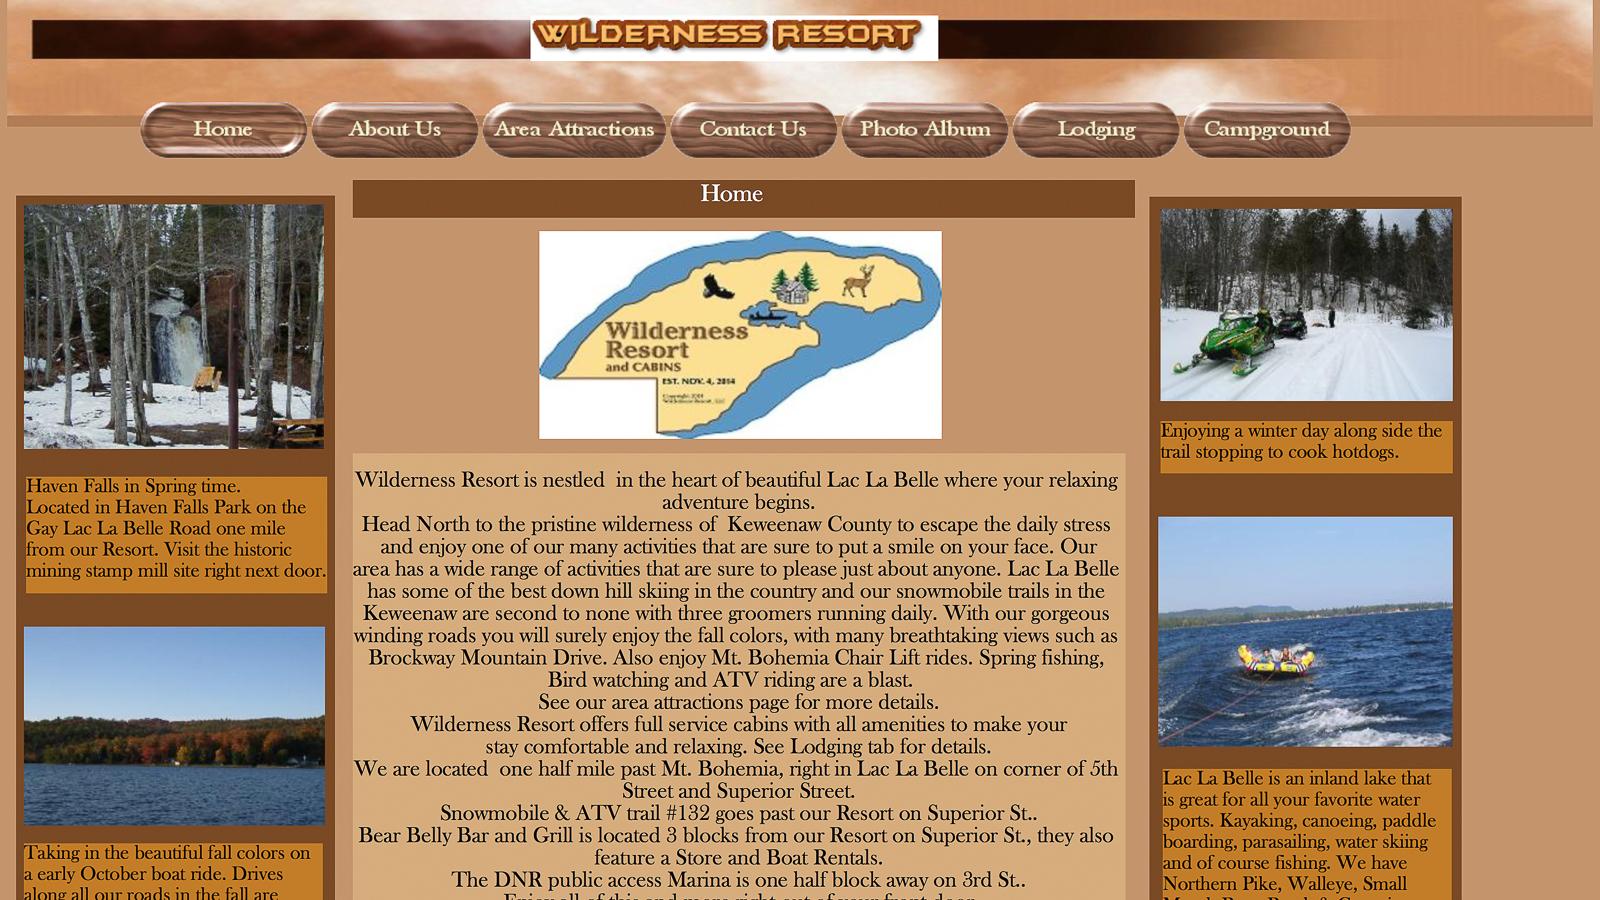 Old Wilderness Resort Website Homepage